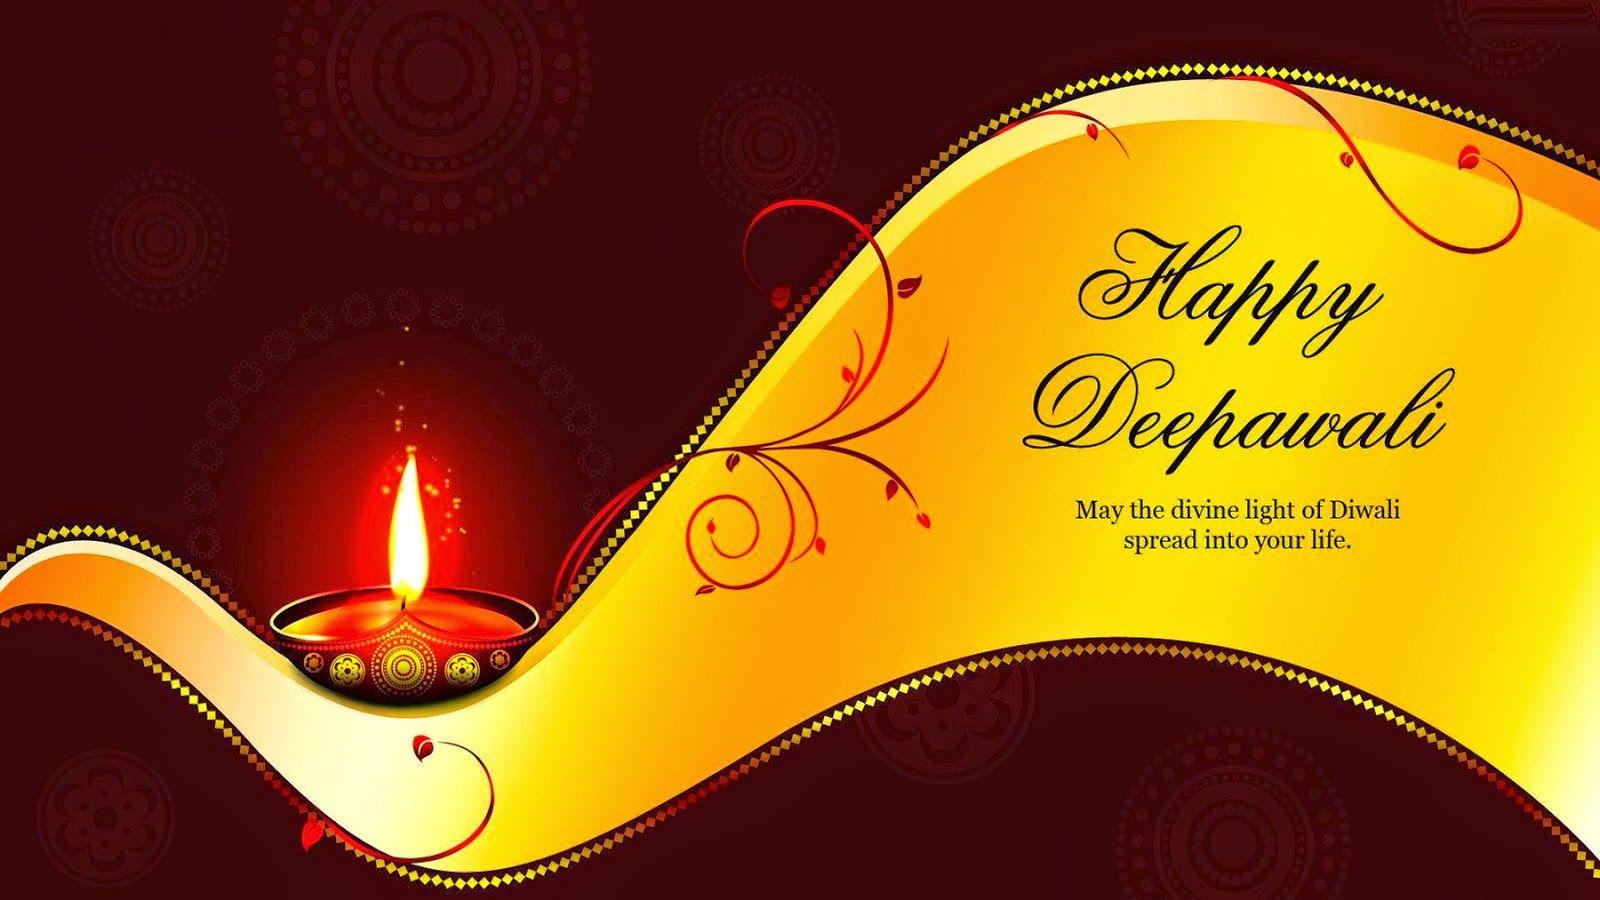 Happy Deepawali 2015 Hd Wallpaper Diwali Quotes Greetings Wishes